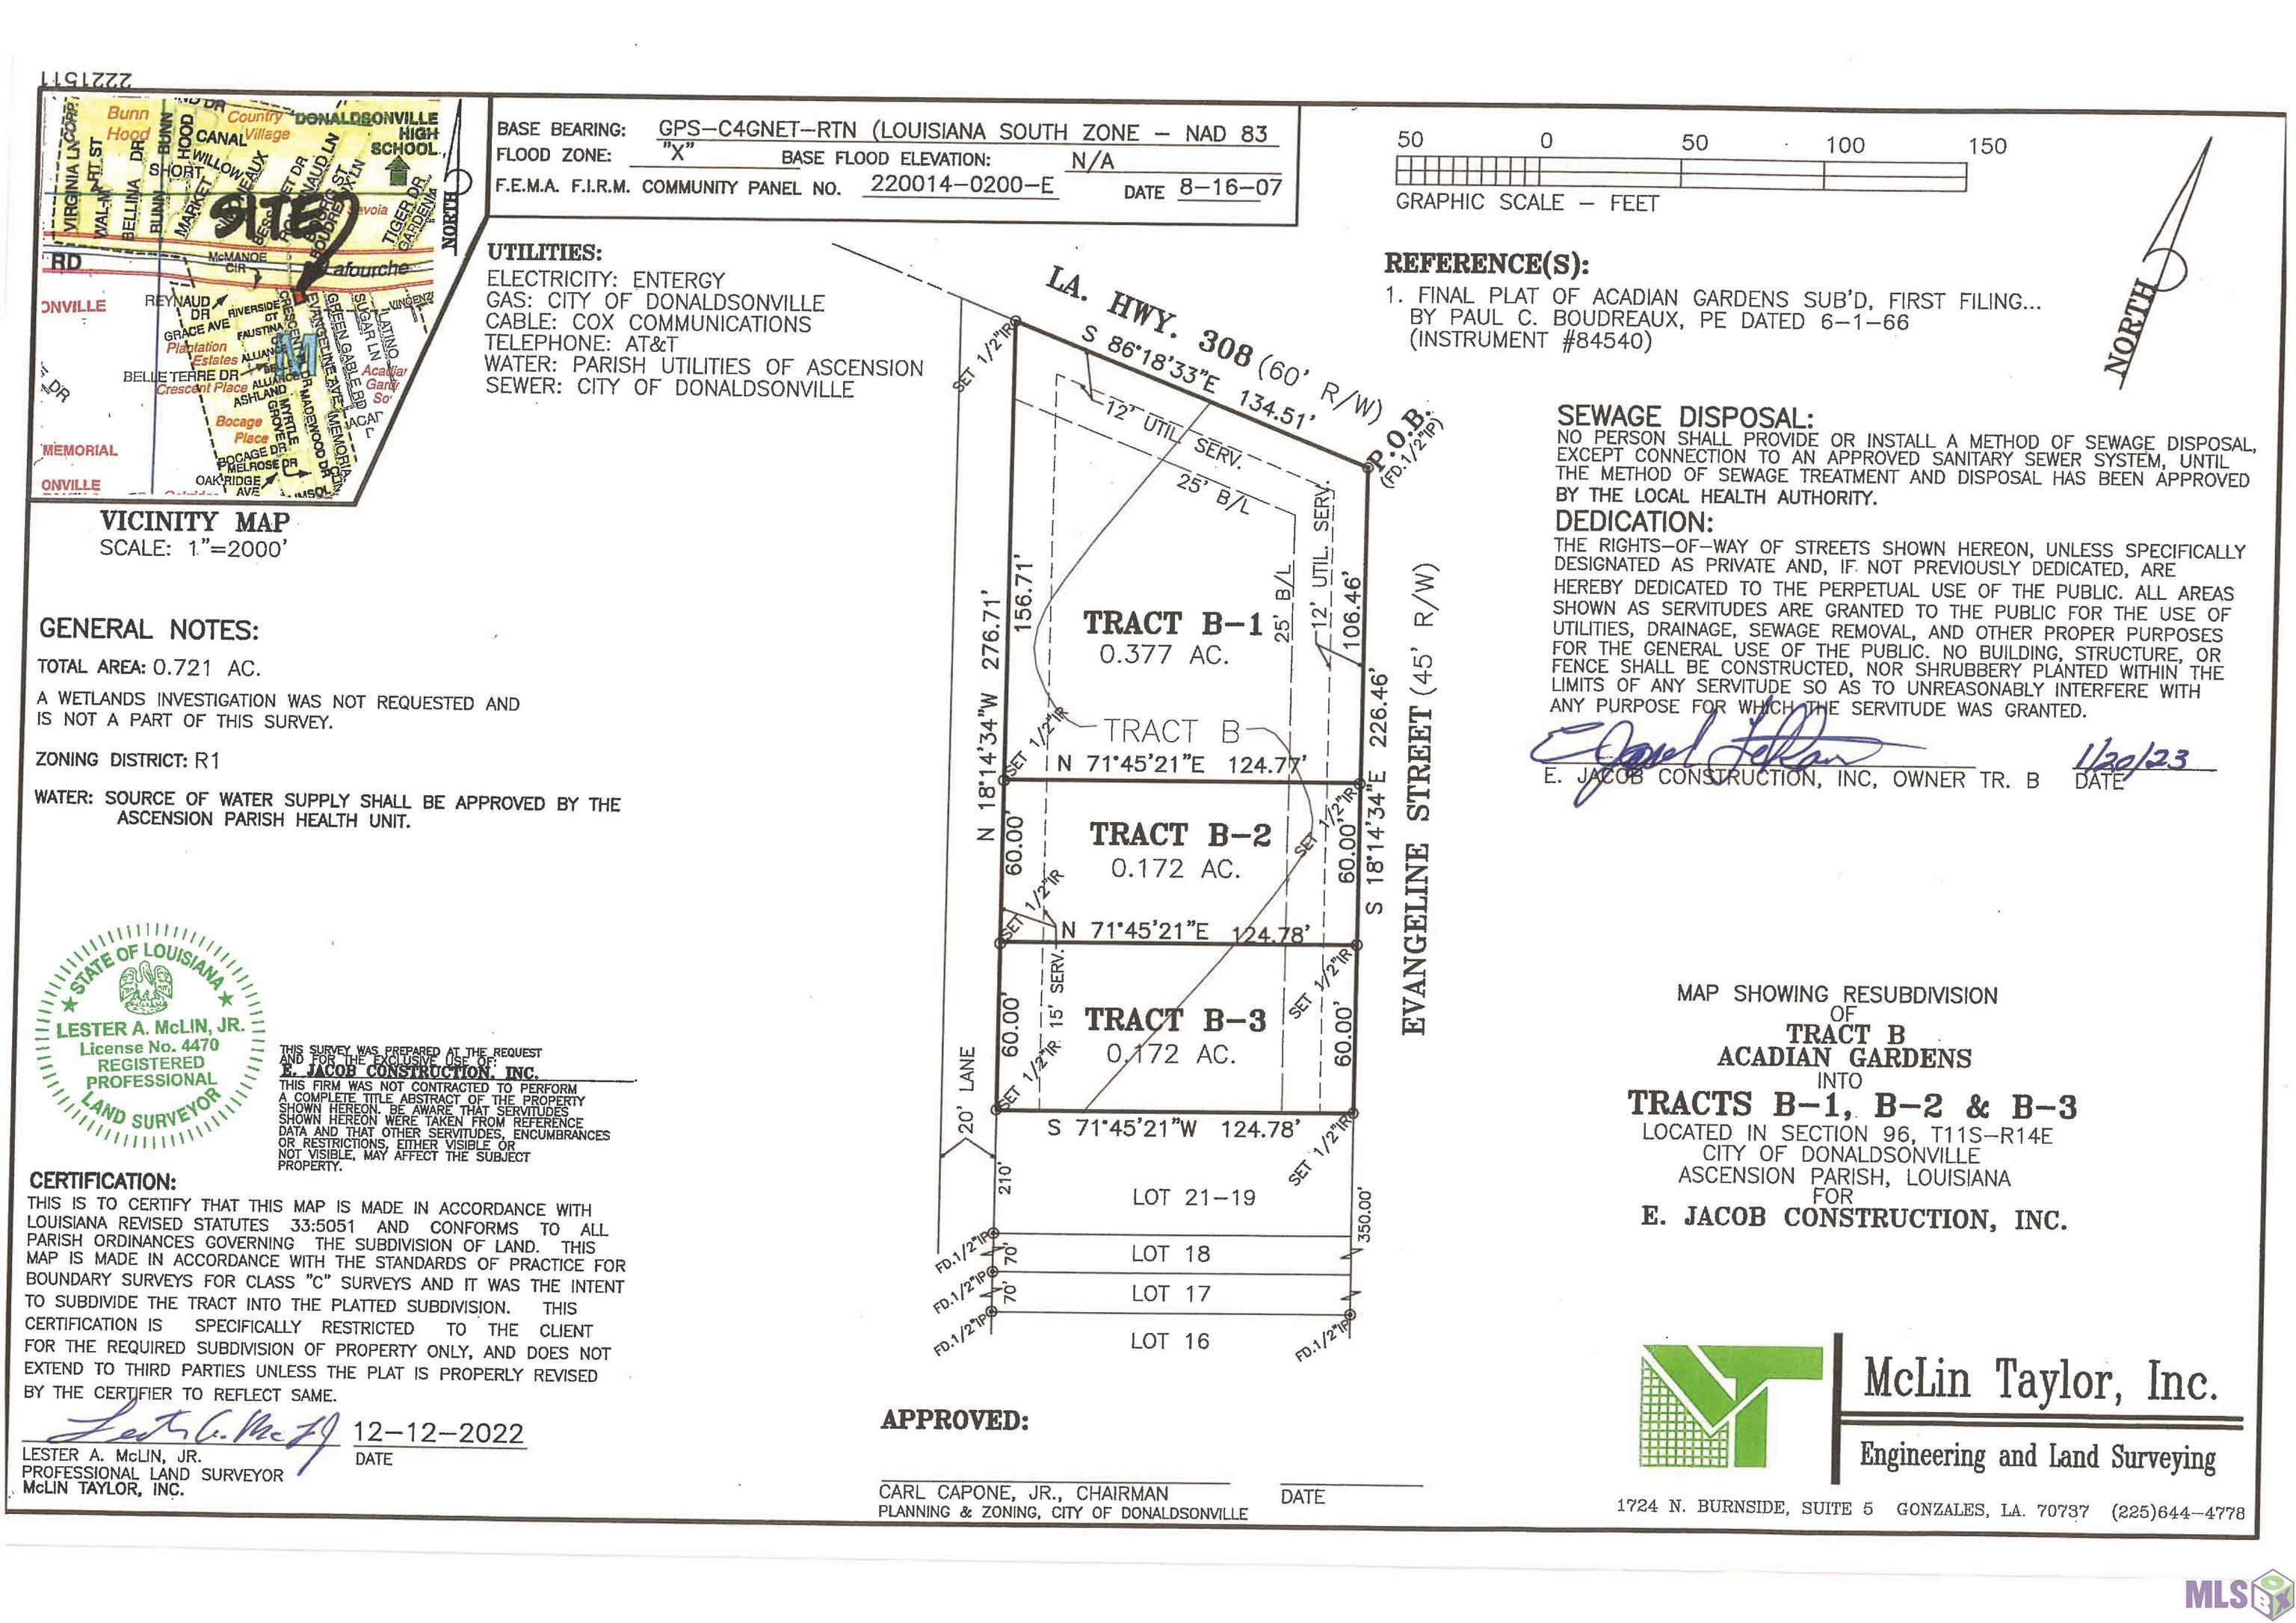 Proposed lot B EVANGELINE DR, Donaldsonville, LA 70346